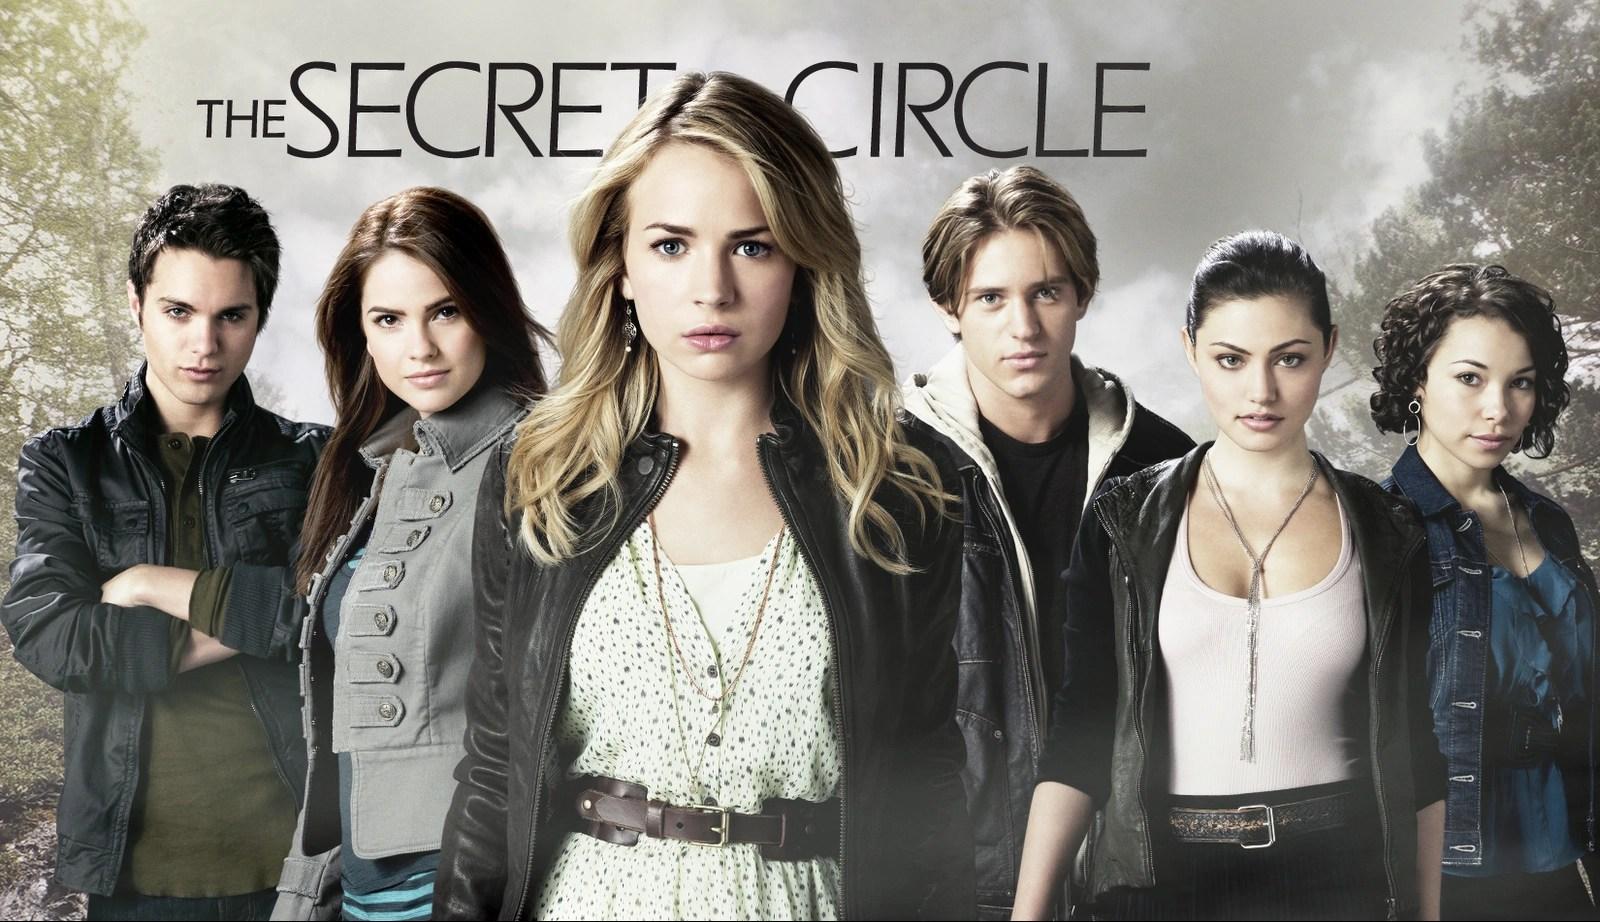 https://i2.wp.com/img2.wikia.nocookie.net/__cb20131208205442/secretcircle/images/c/cc/The-secret-circle-0.png